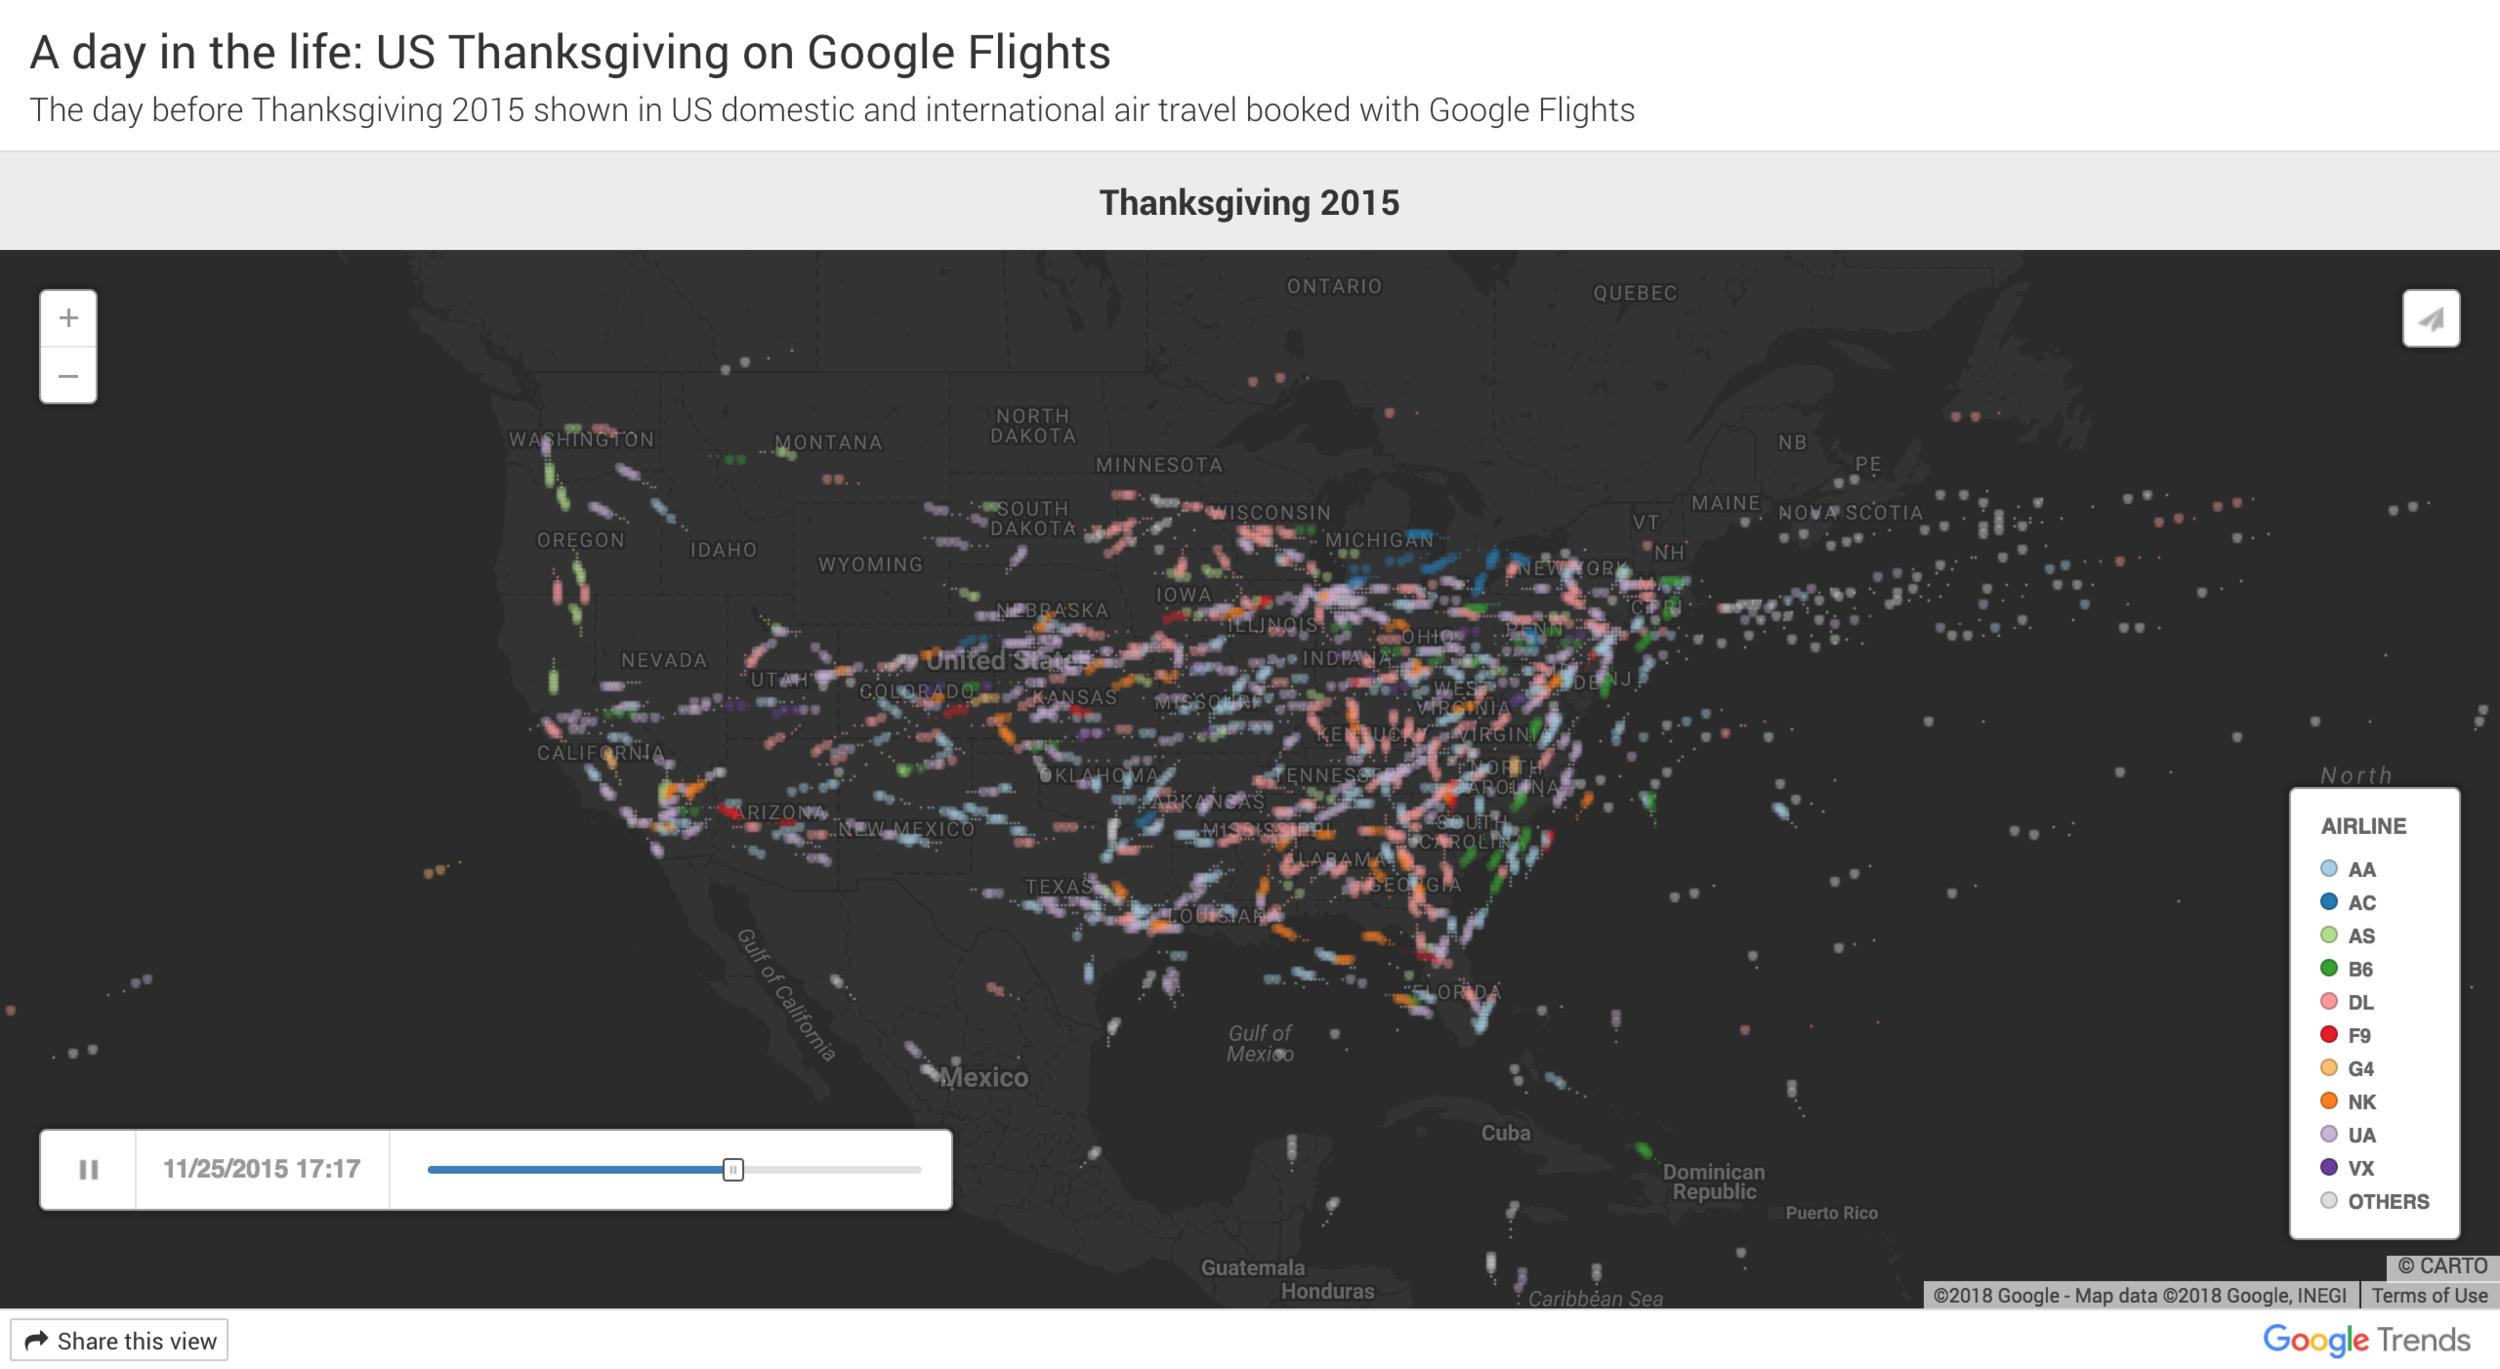 googleflightsthanksgiving2015.png